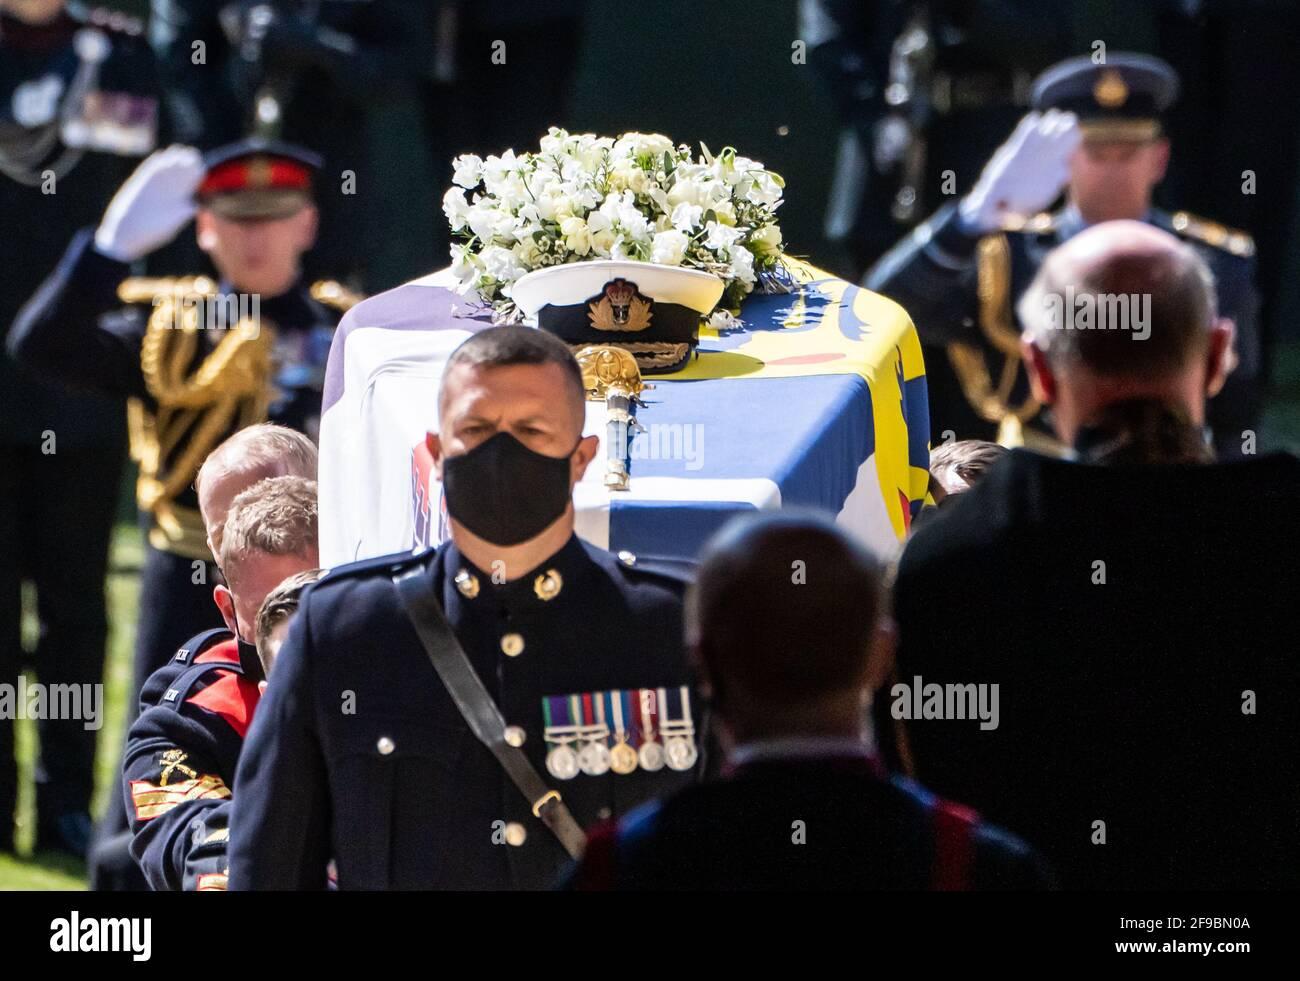 Portadores de Pall que llevan el ataúd a la Capilla durante el funeral del duque de Edimburgo en la capilla de San Jorge, Castillo de Windsor, Berkshire. Fecha de la foto: Sábado 17 de abril de 2021. Foto de stock